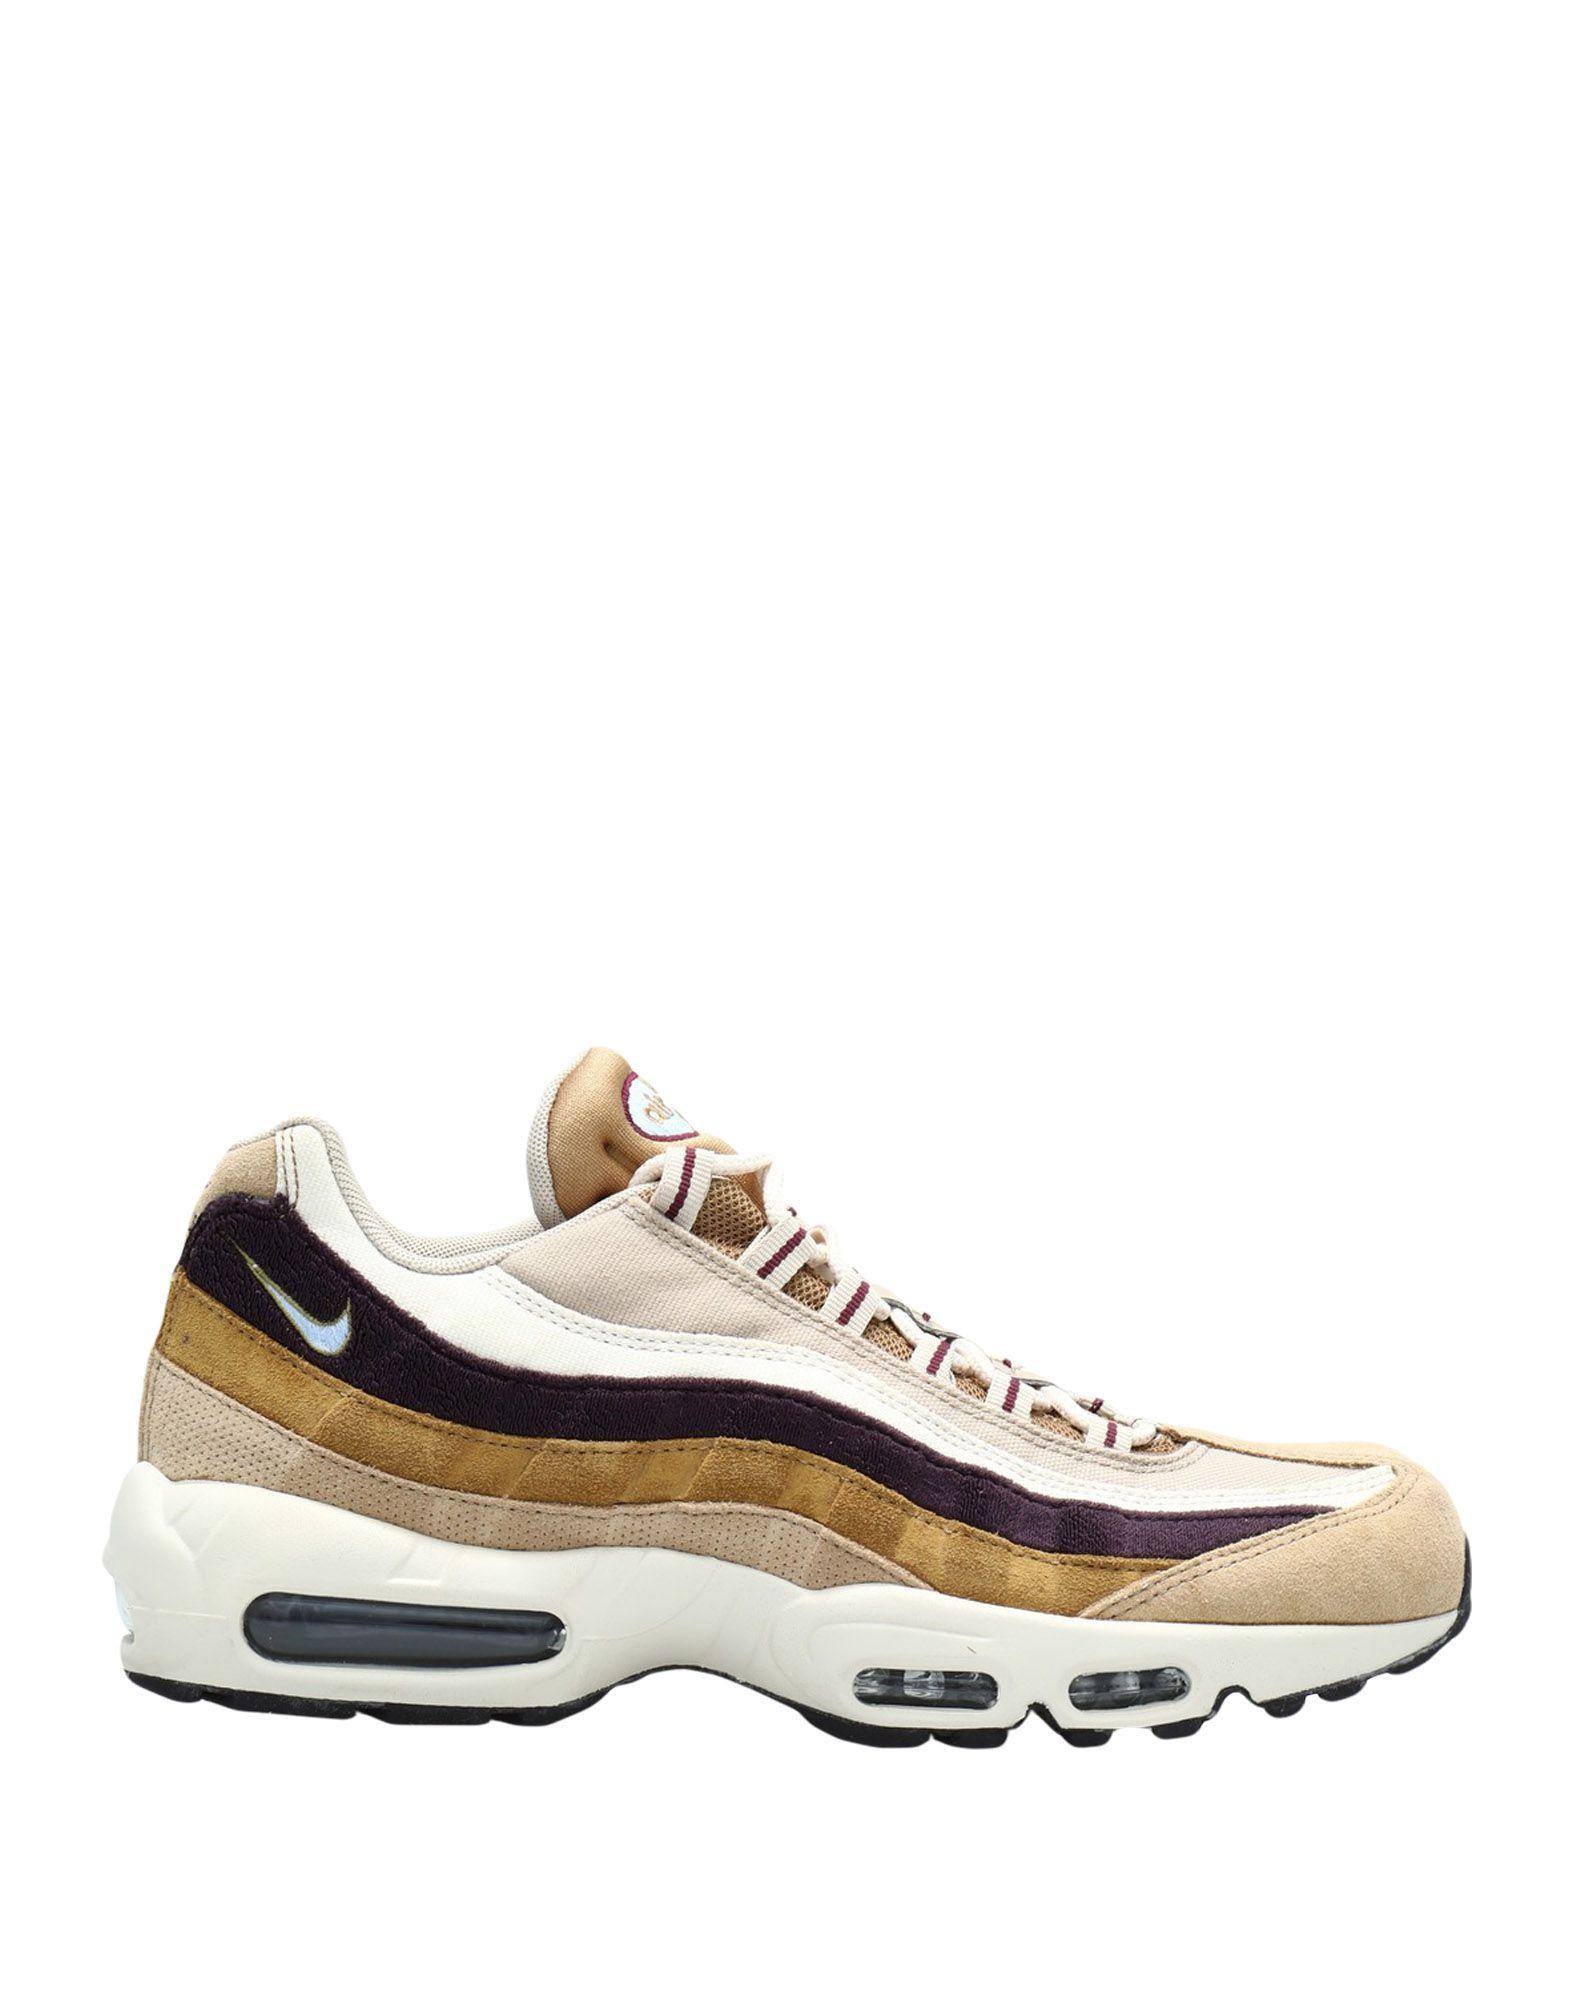 Nike   Air Max 95 Premium  11539705PB Gute Qualität beliebte Schuhe